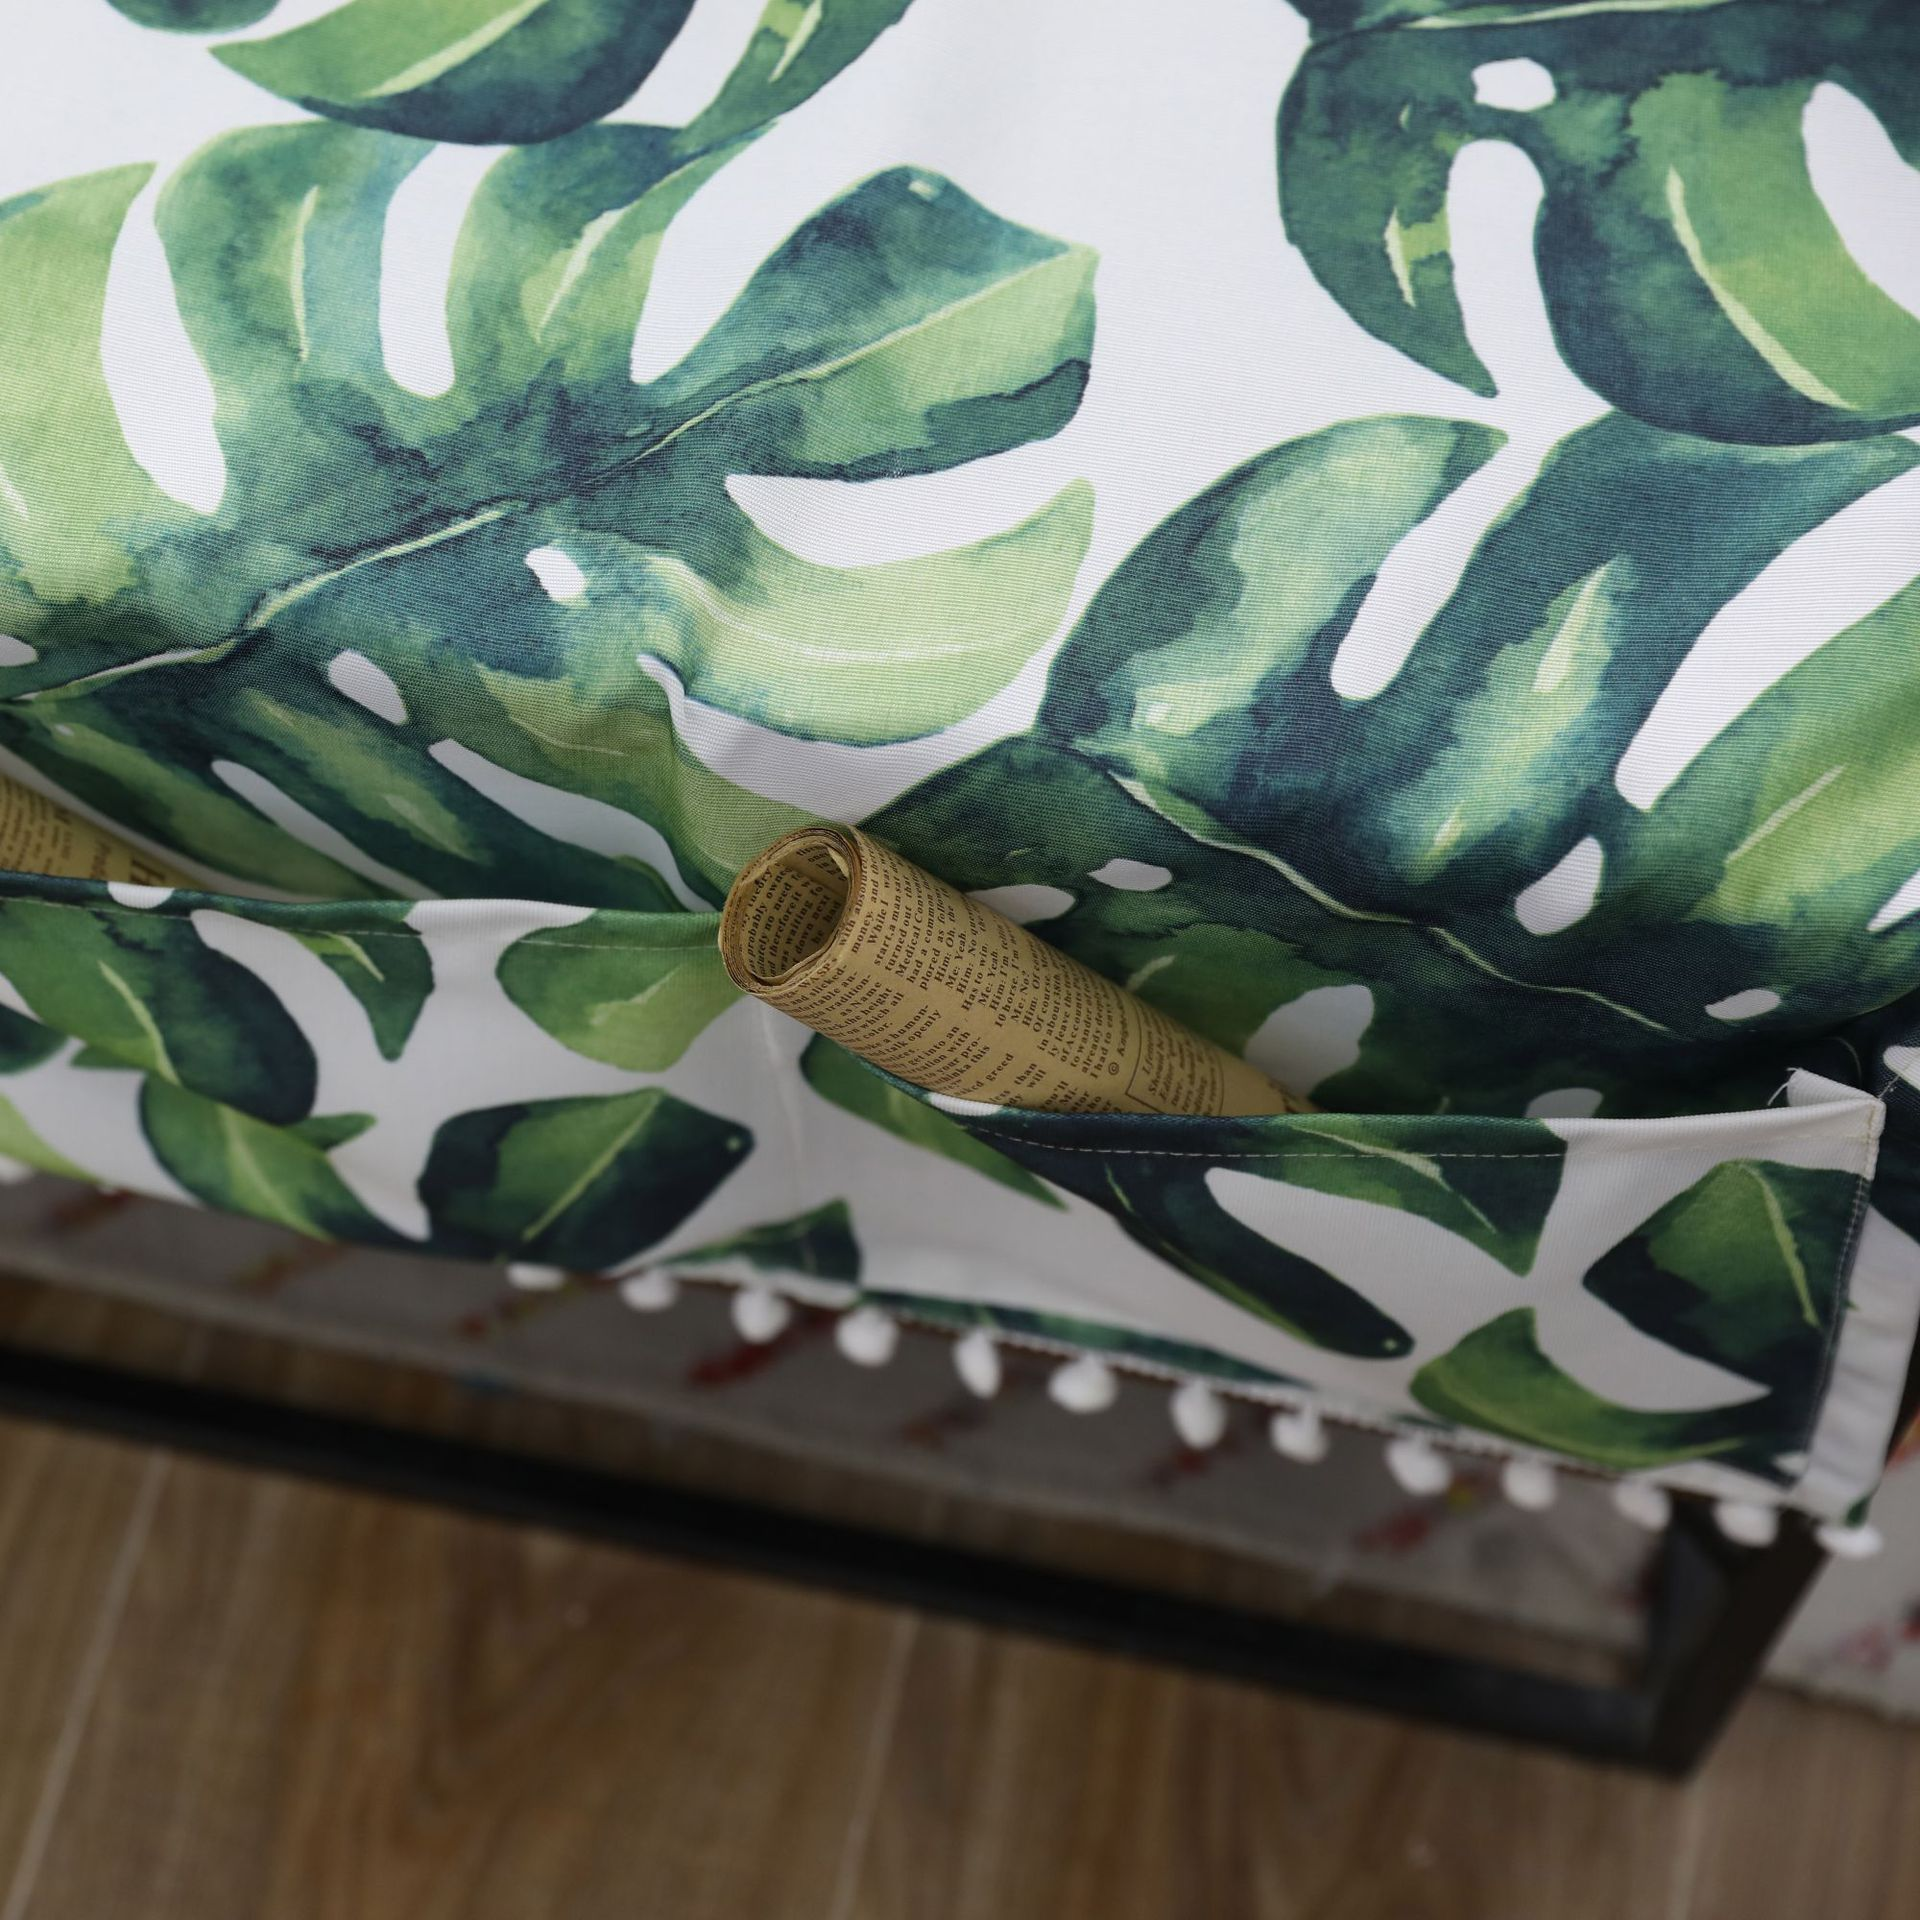 Tortoise back bamboo Table Cloth with Three Pocket Ear of Wheat Nappe TV Bench Mantel Rectangular Tea Table Cover Toalha De Mesa